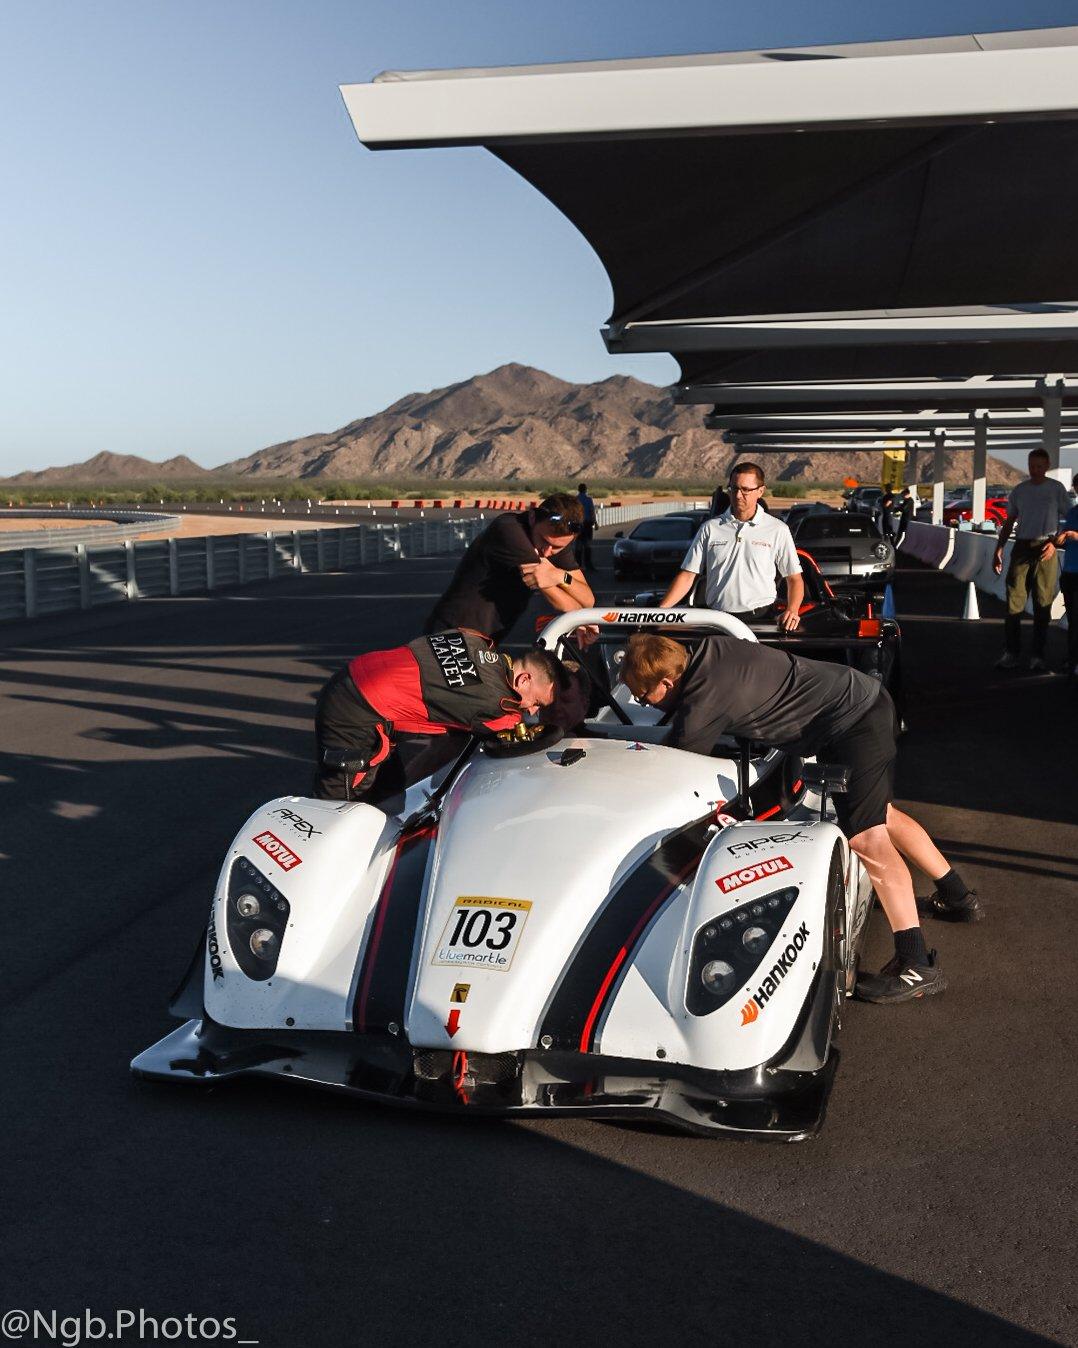 Apex Car Club Racing Pit Crew